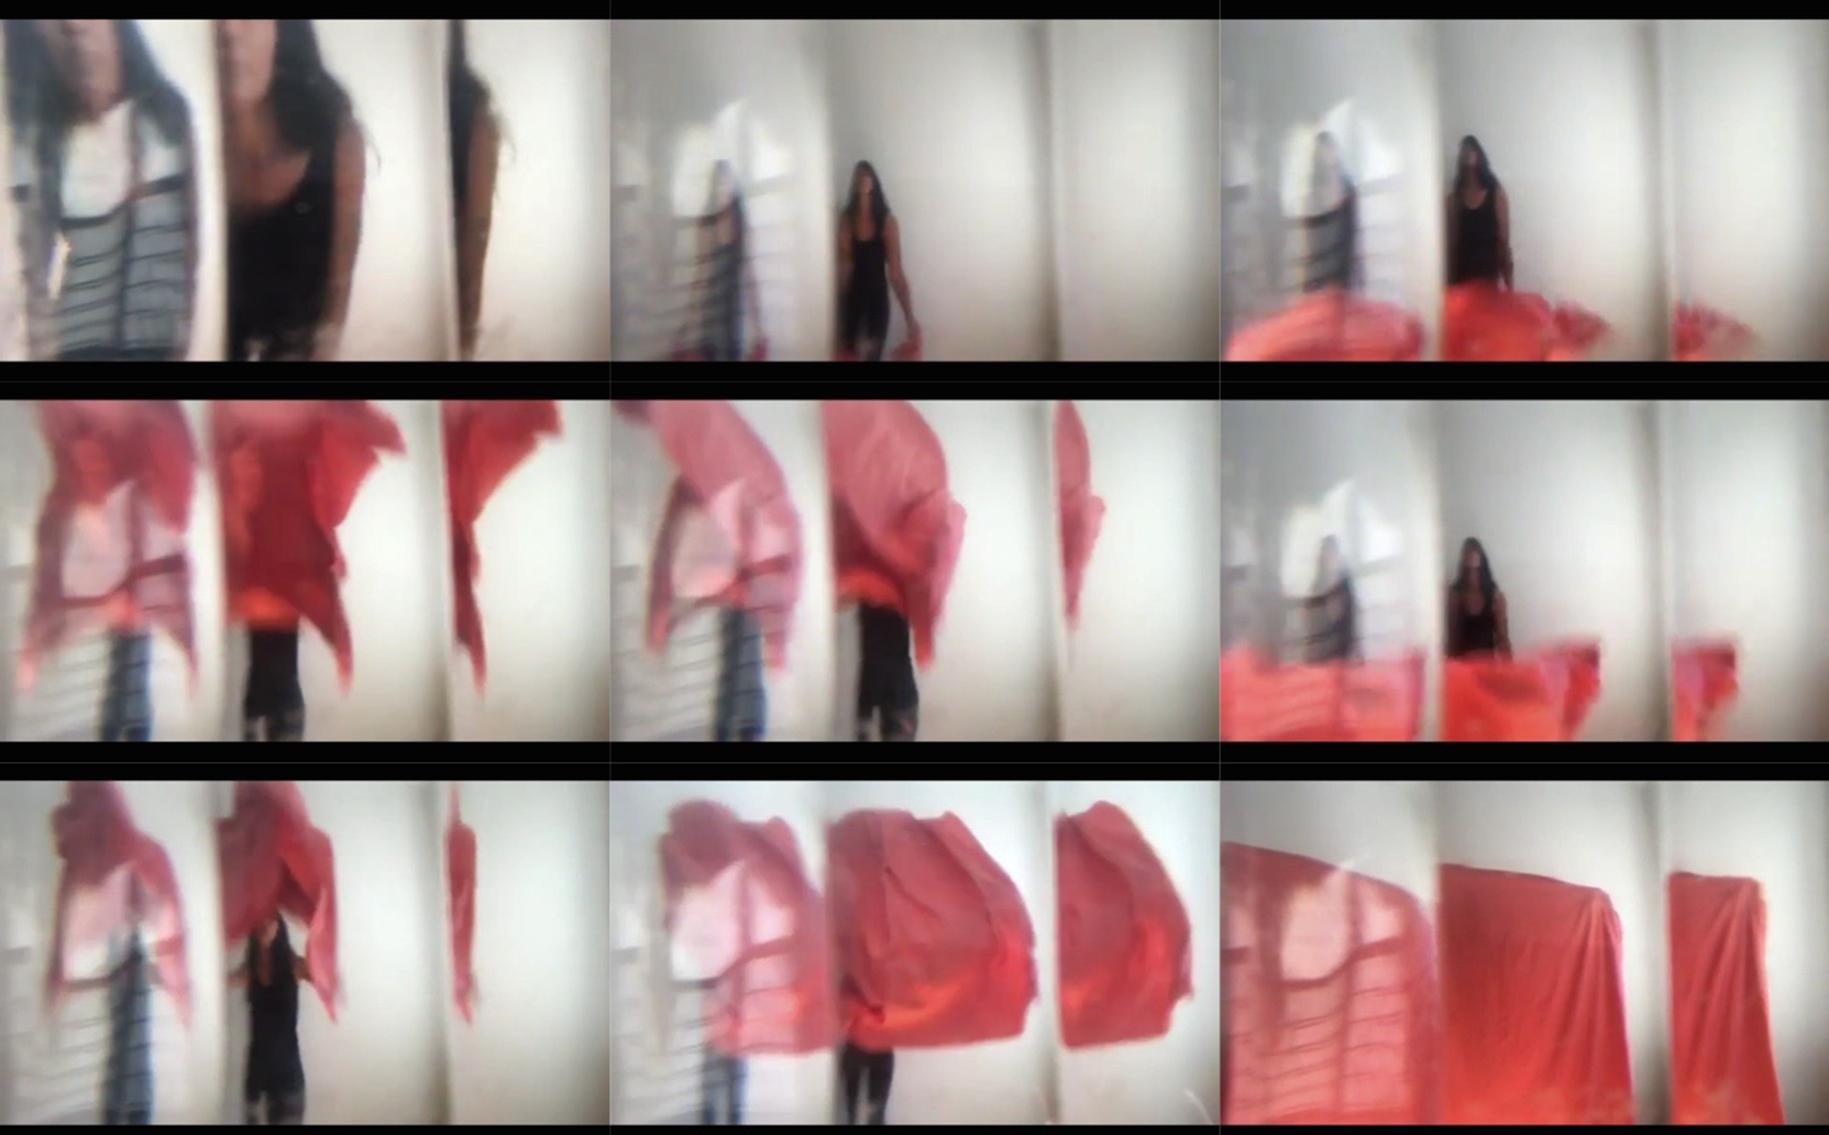 redflag.still.print.jpg